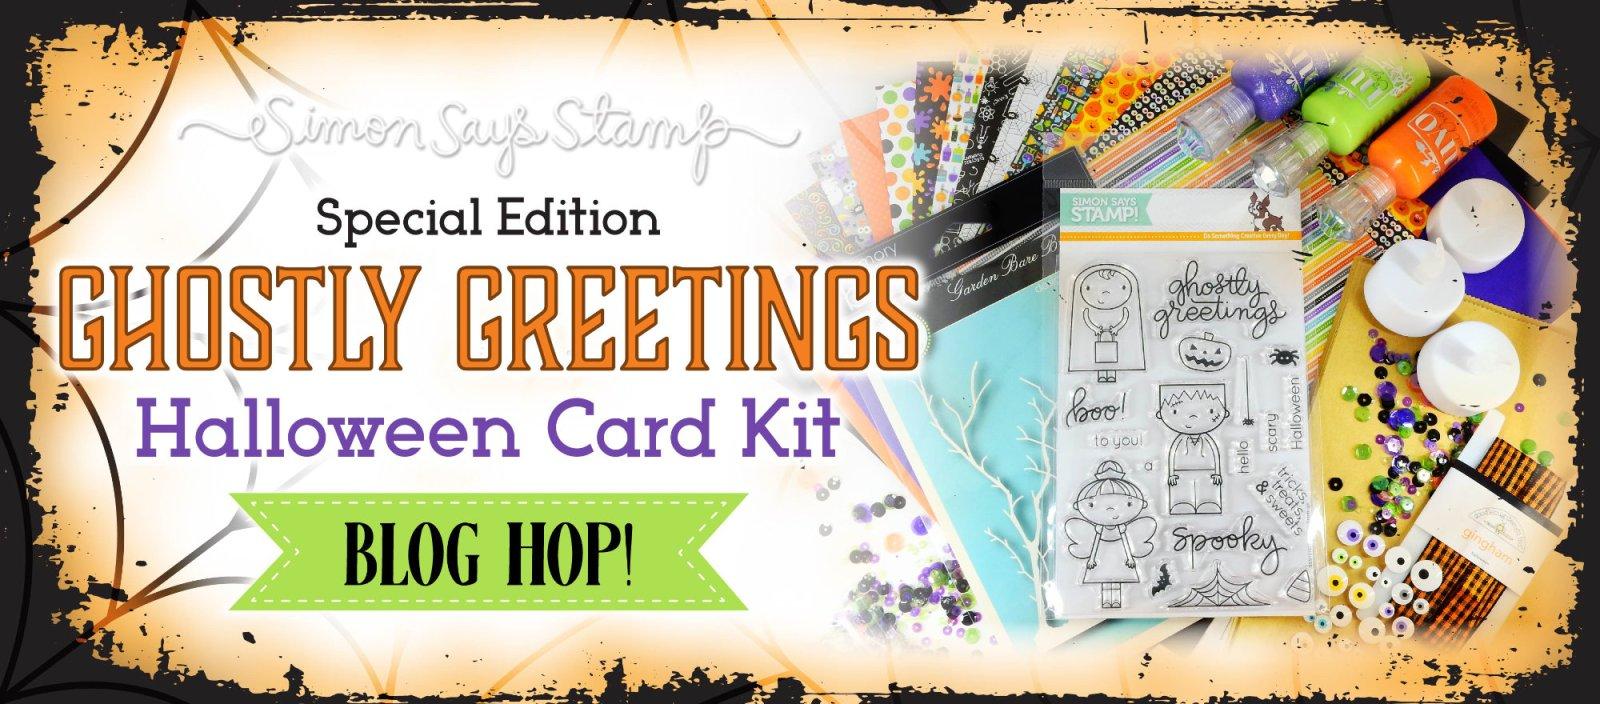 Special Edition Card Kit_blog hop_2